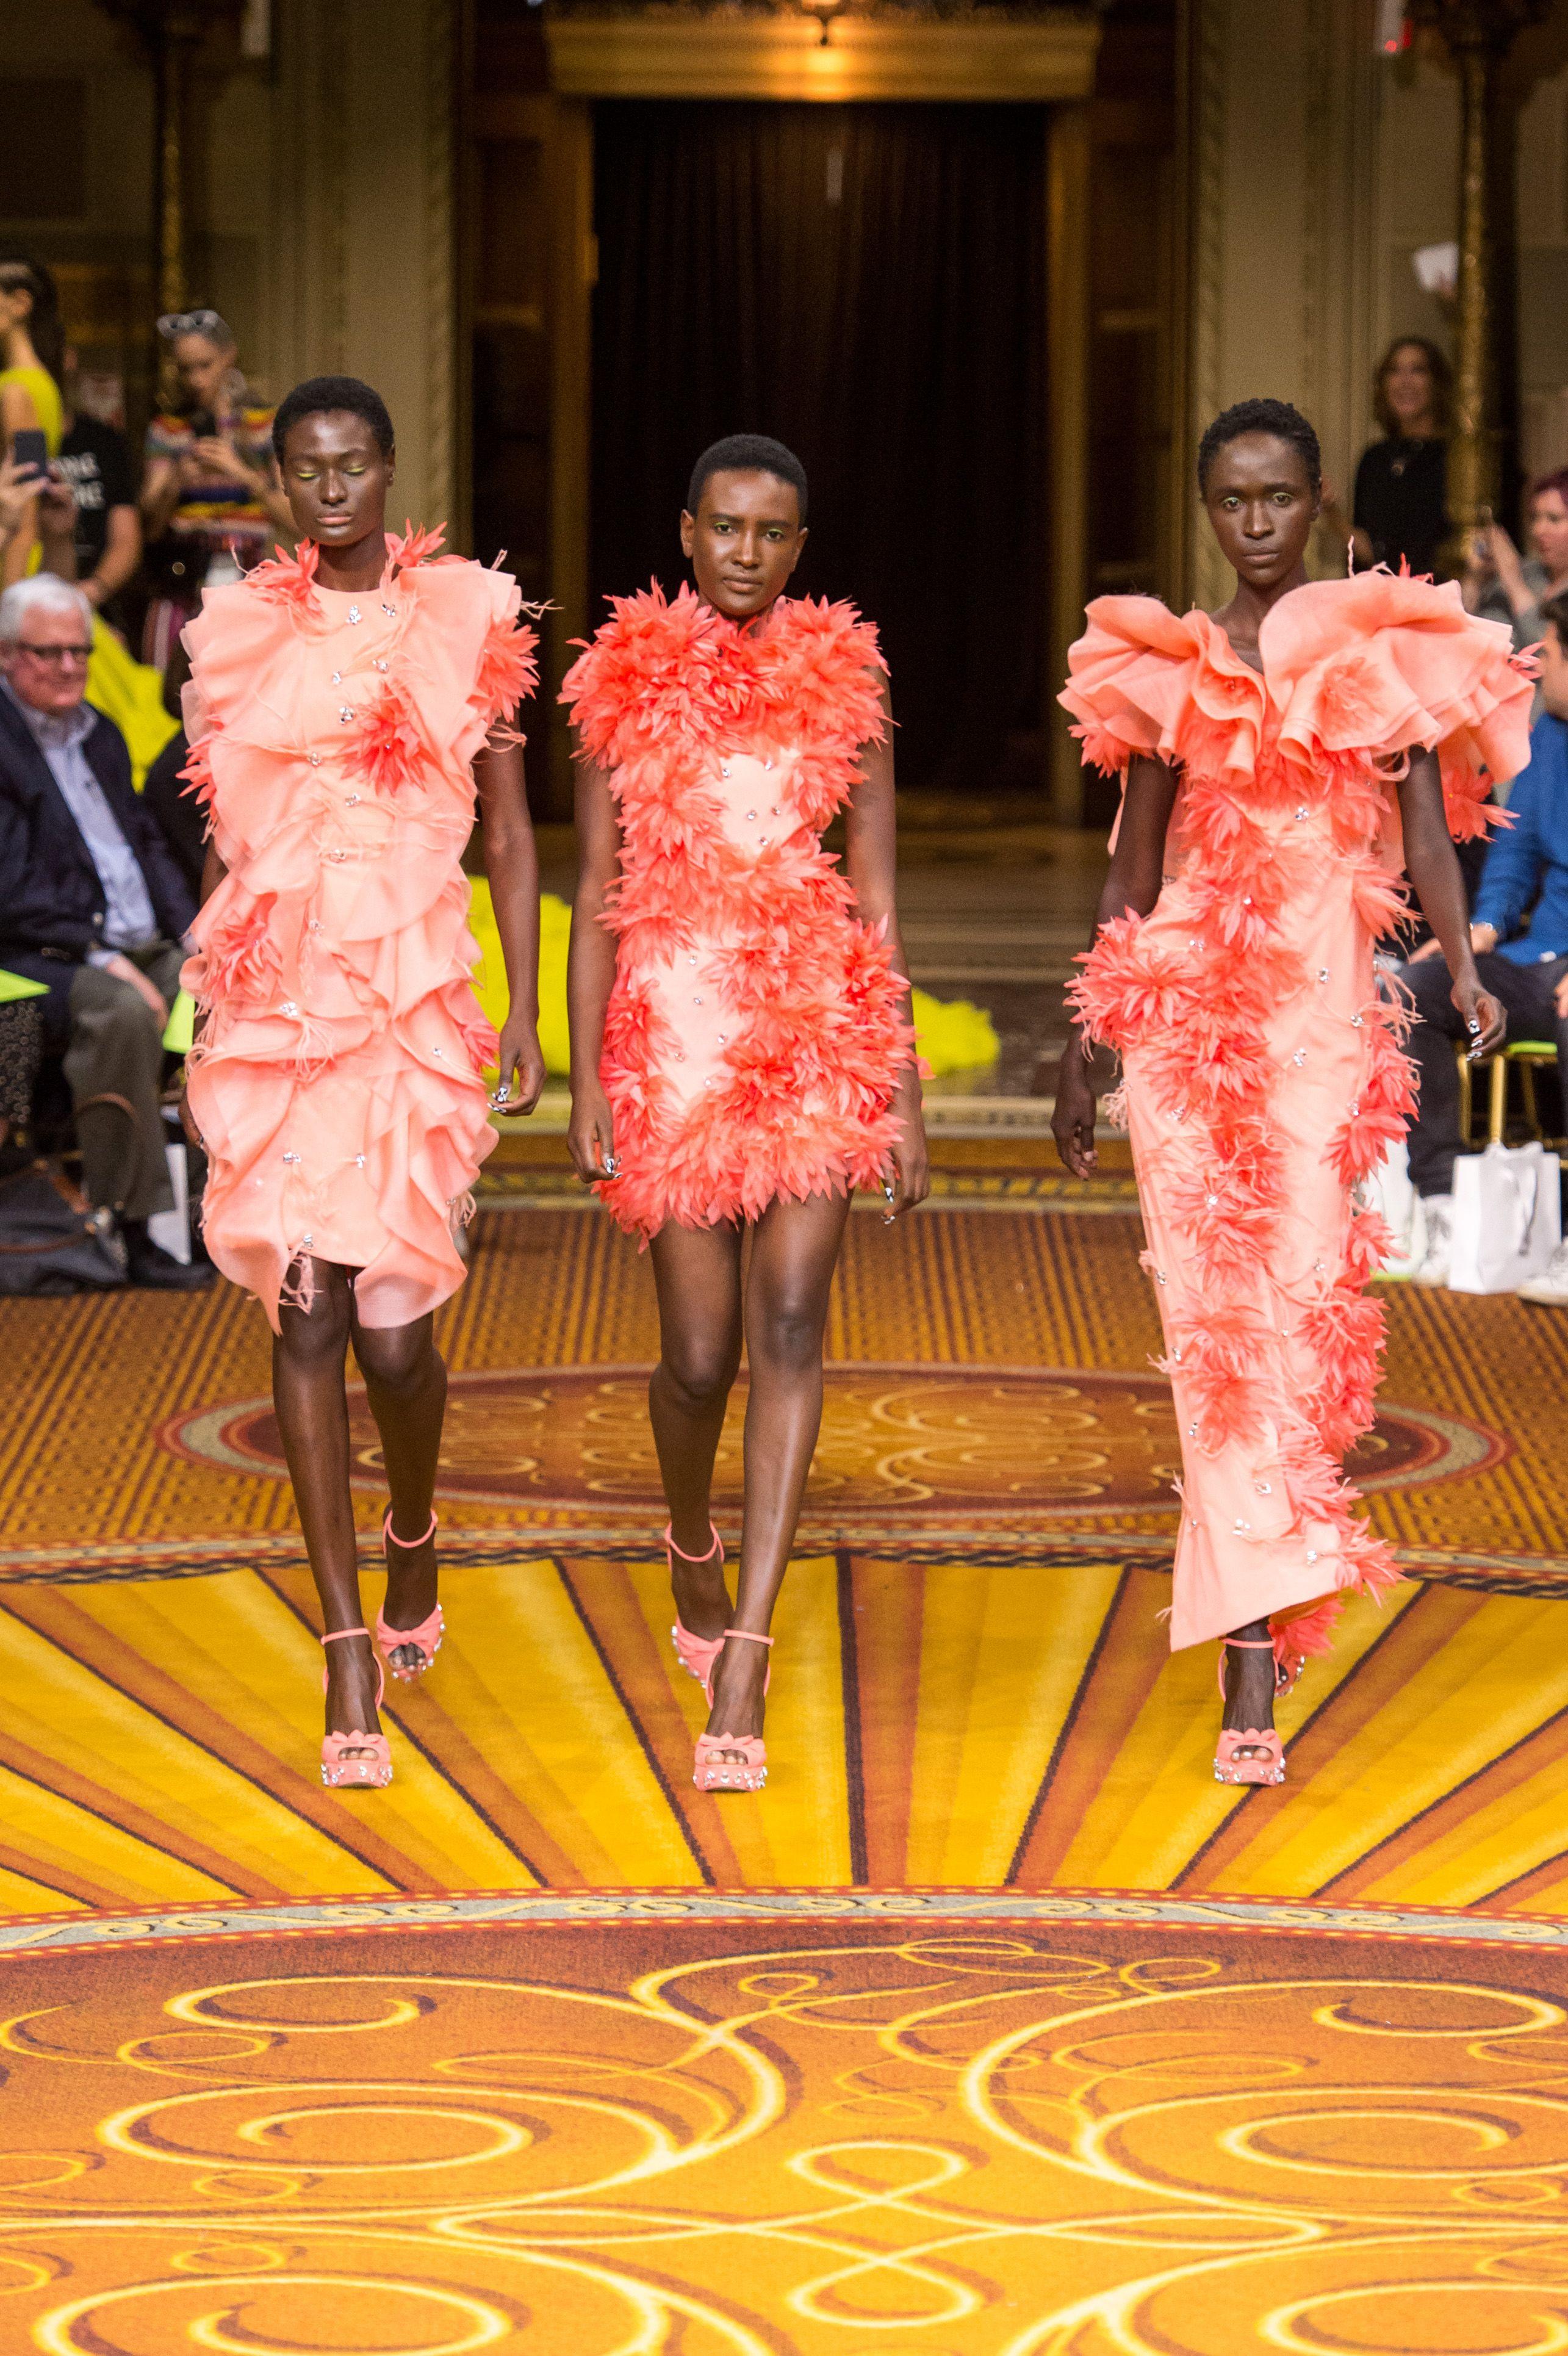 Models on the catwalk Christian Siriano show, Runway, Spring Summer 2019, New York Fashion Week, USA – 08 Sep 2018